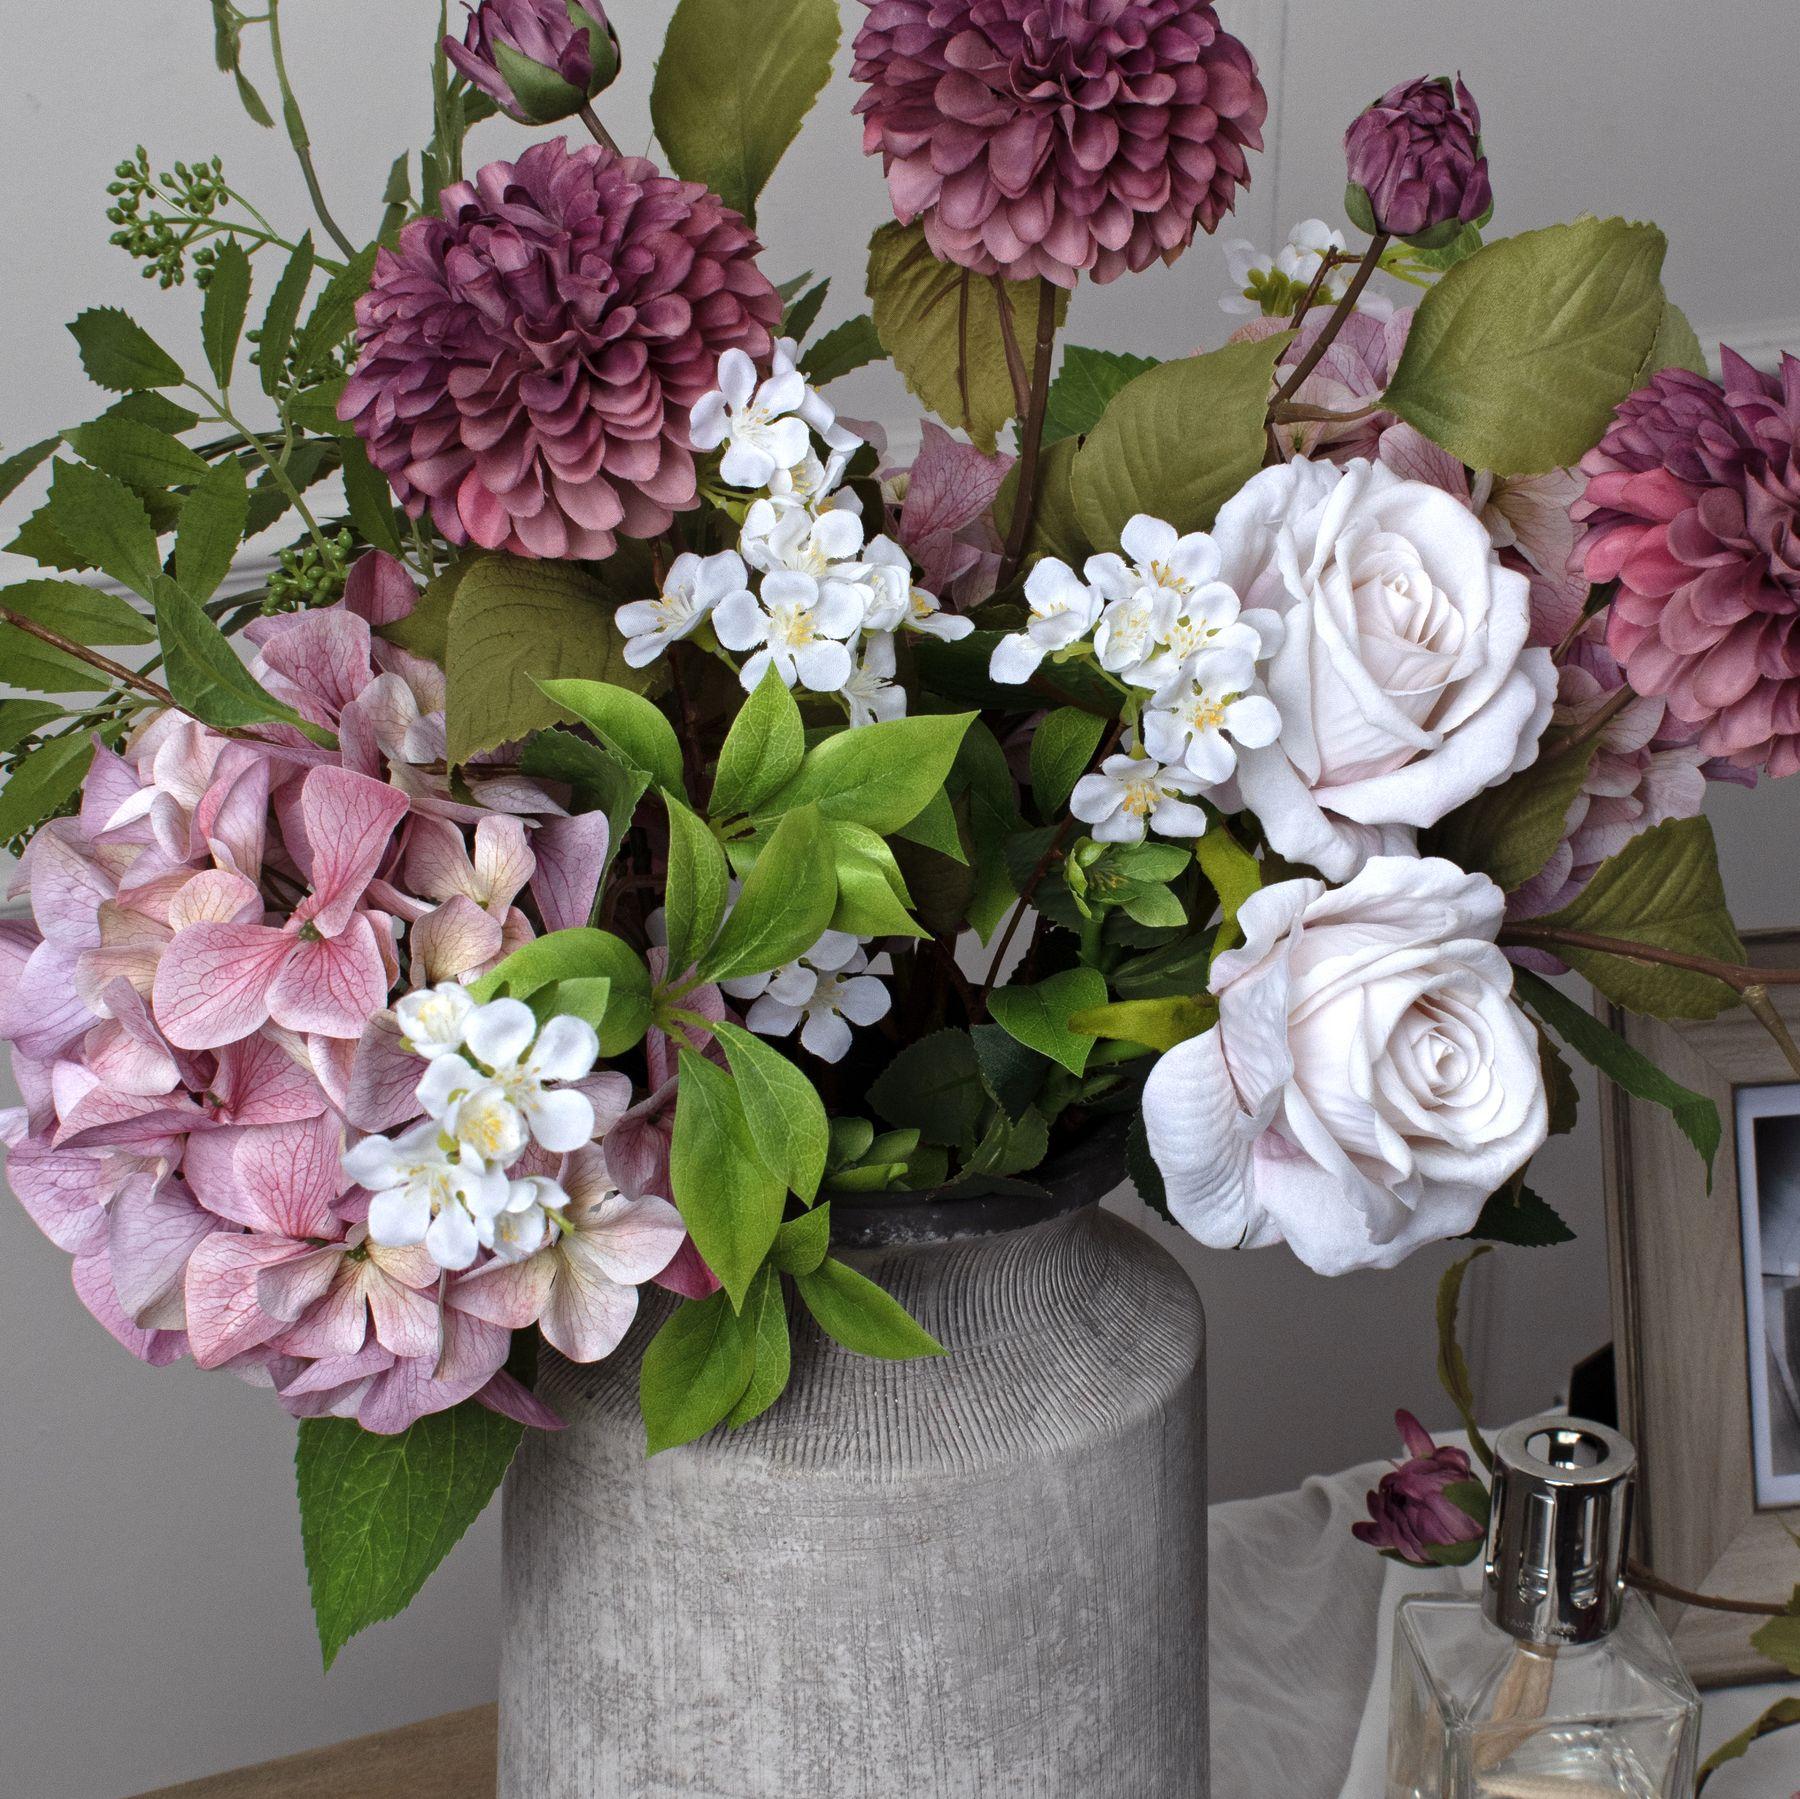 Bloomville Urn Stone Vase - Image 4